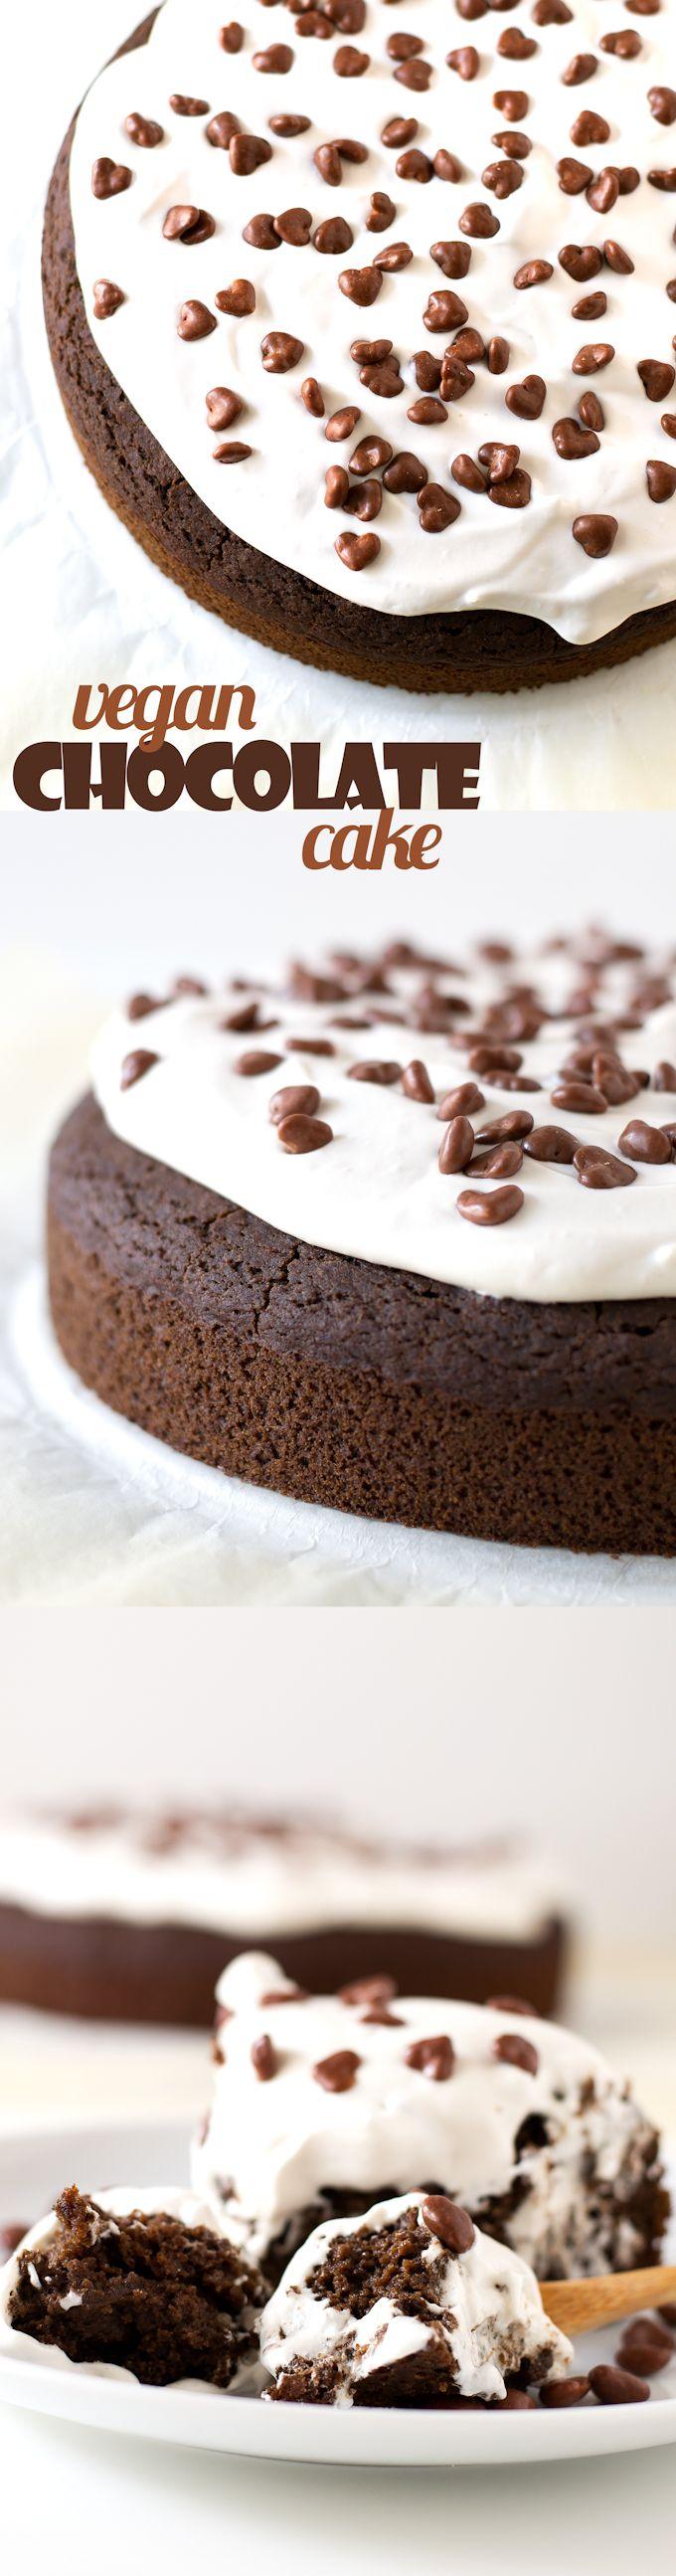 Vegan Gluten Free Chocolate Cake. This might be my new celebration cake!